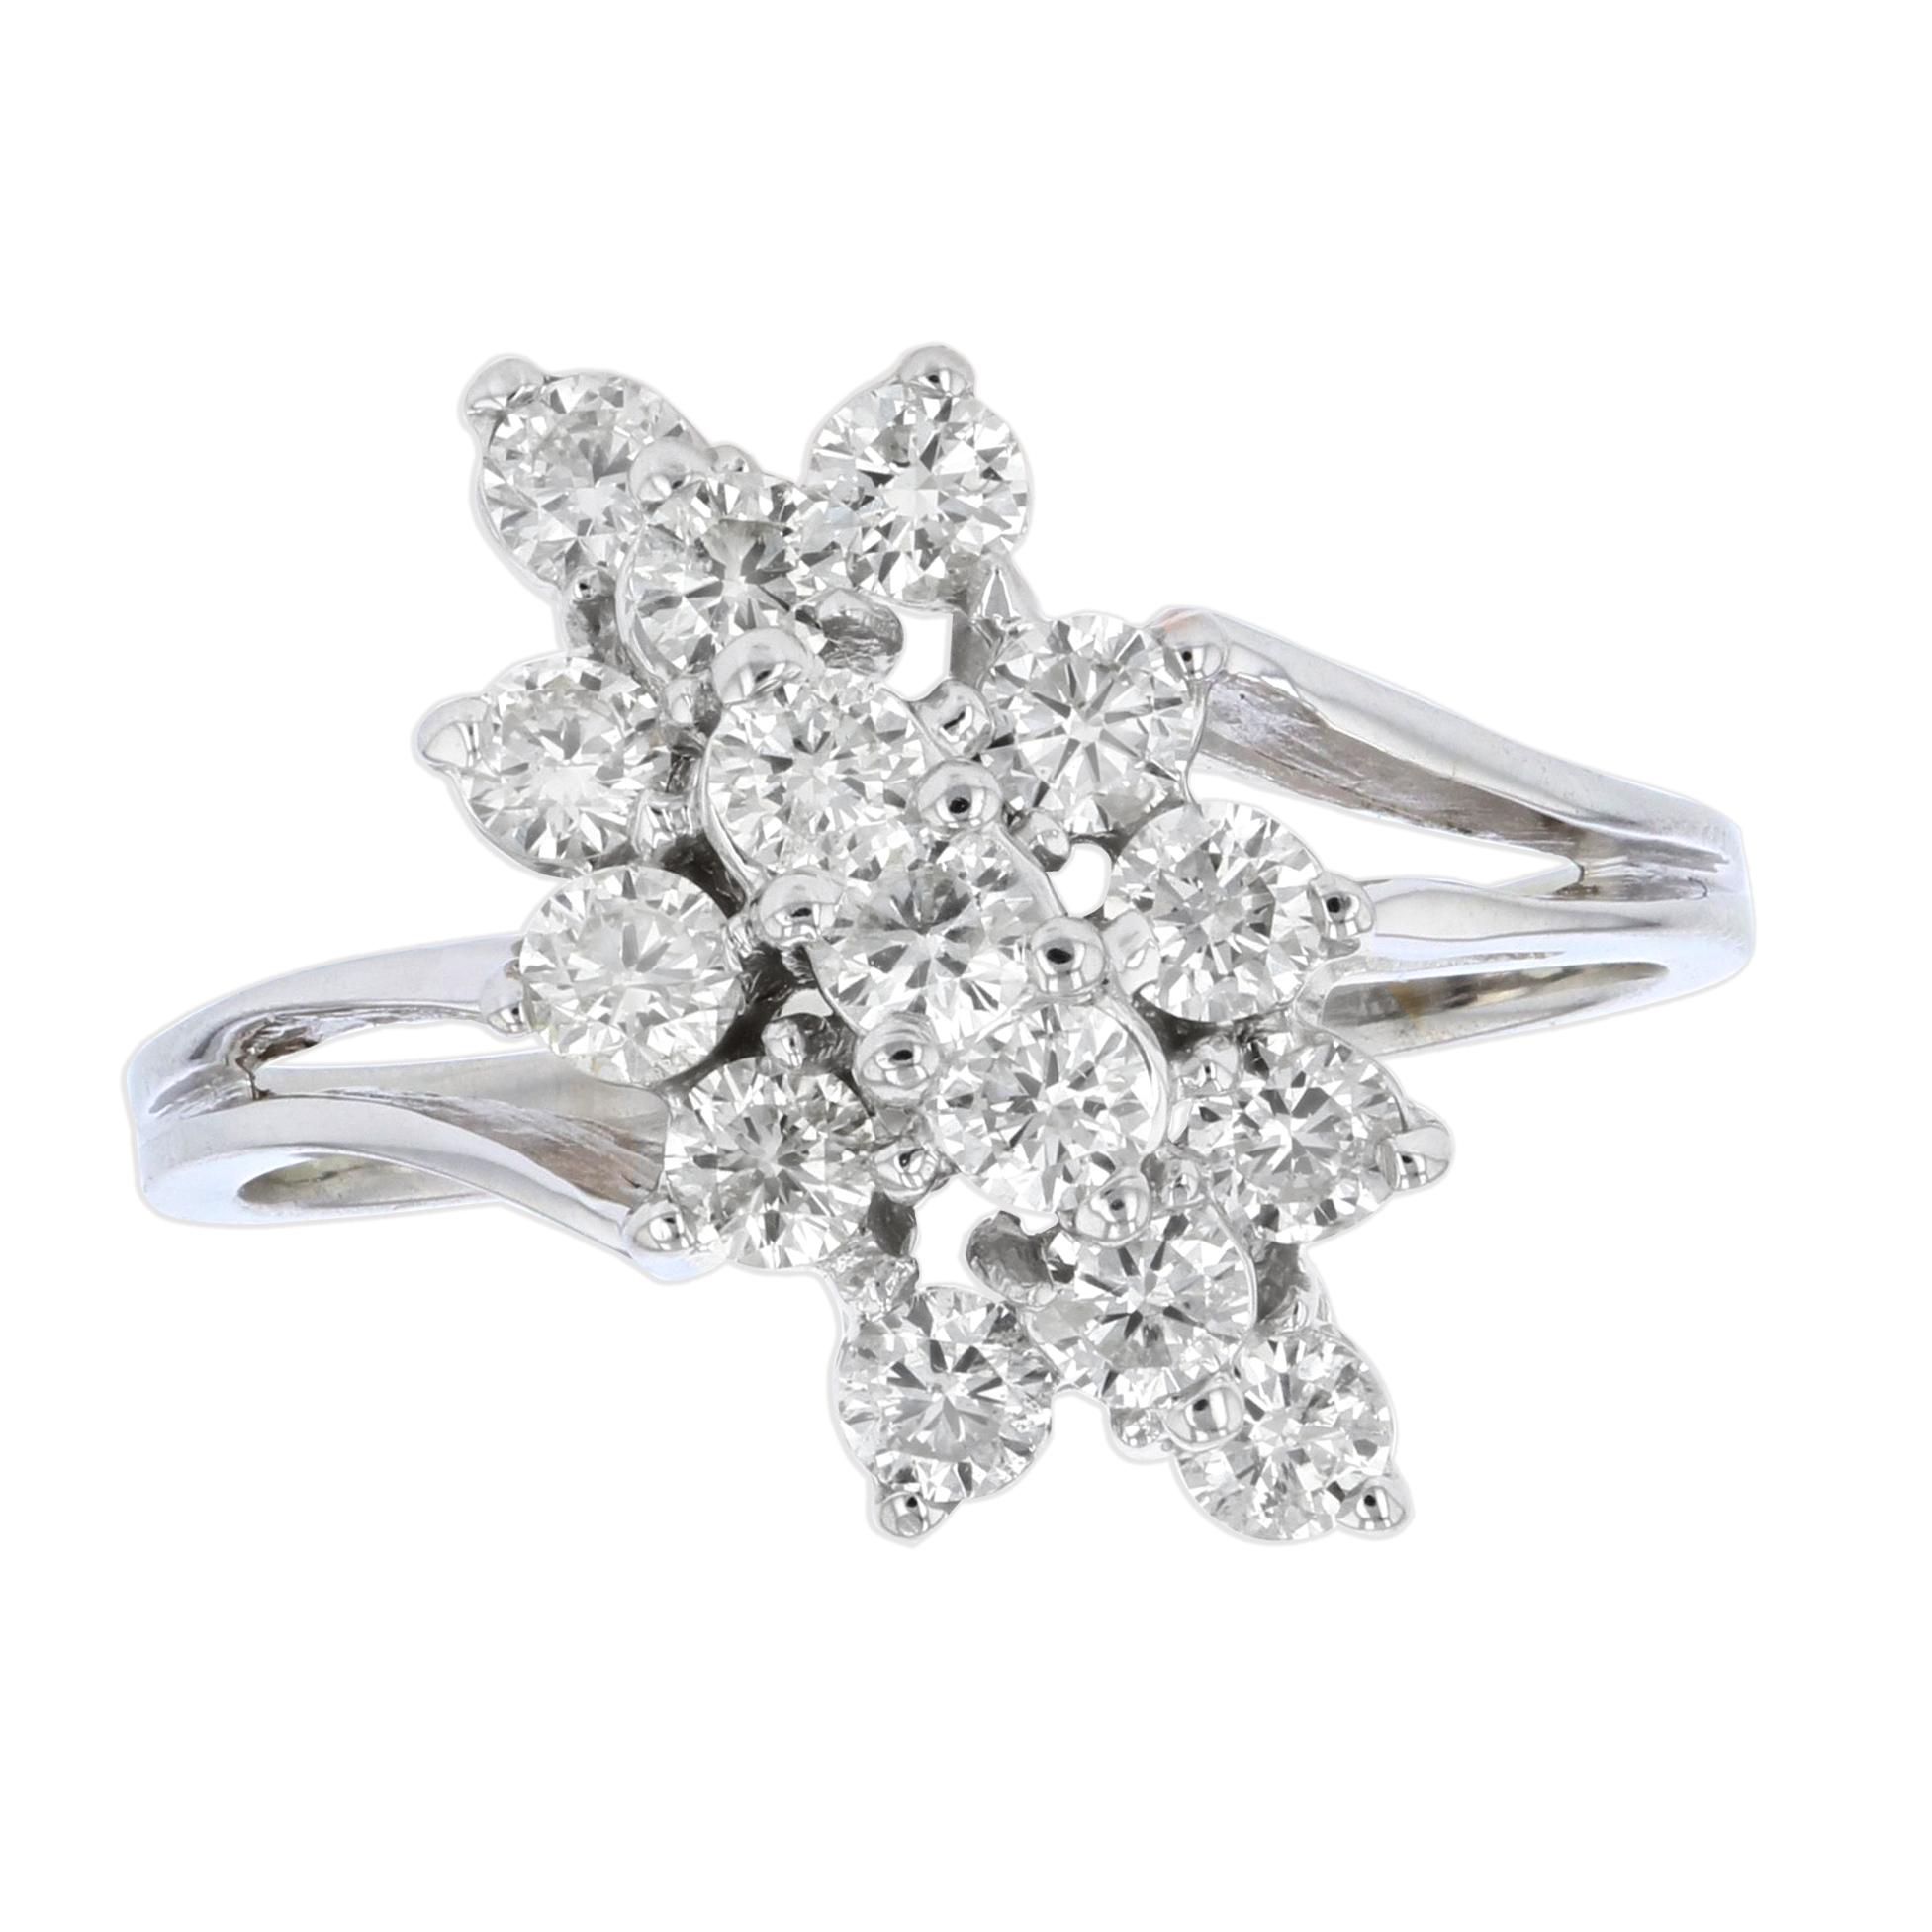 View 1.00 Ctw Diamond Ring in 14K Gold